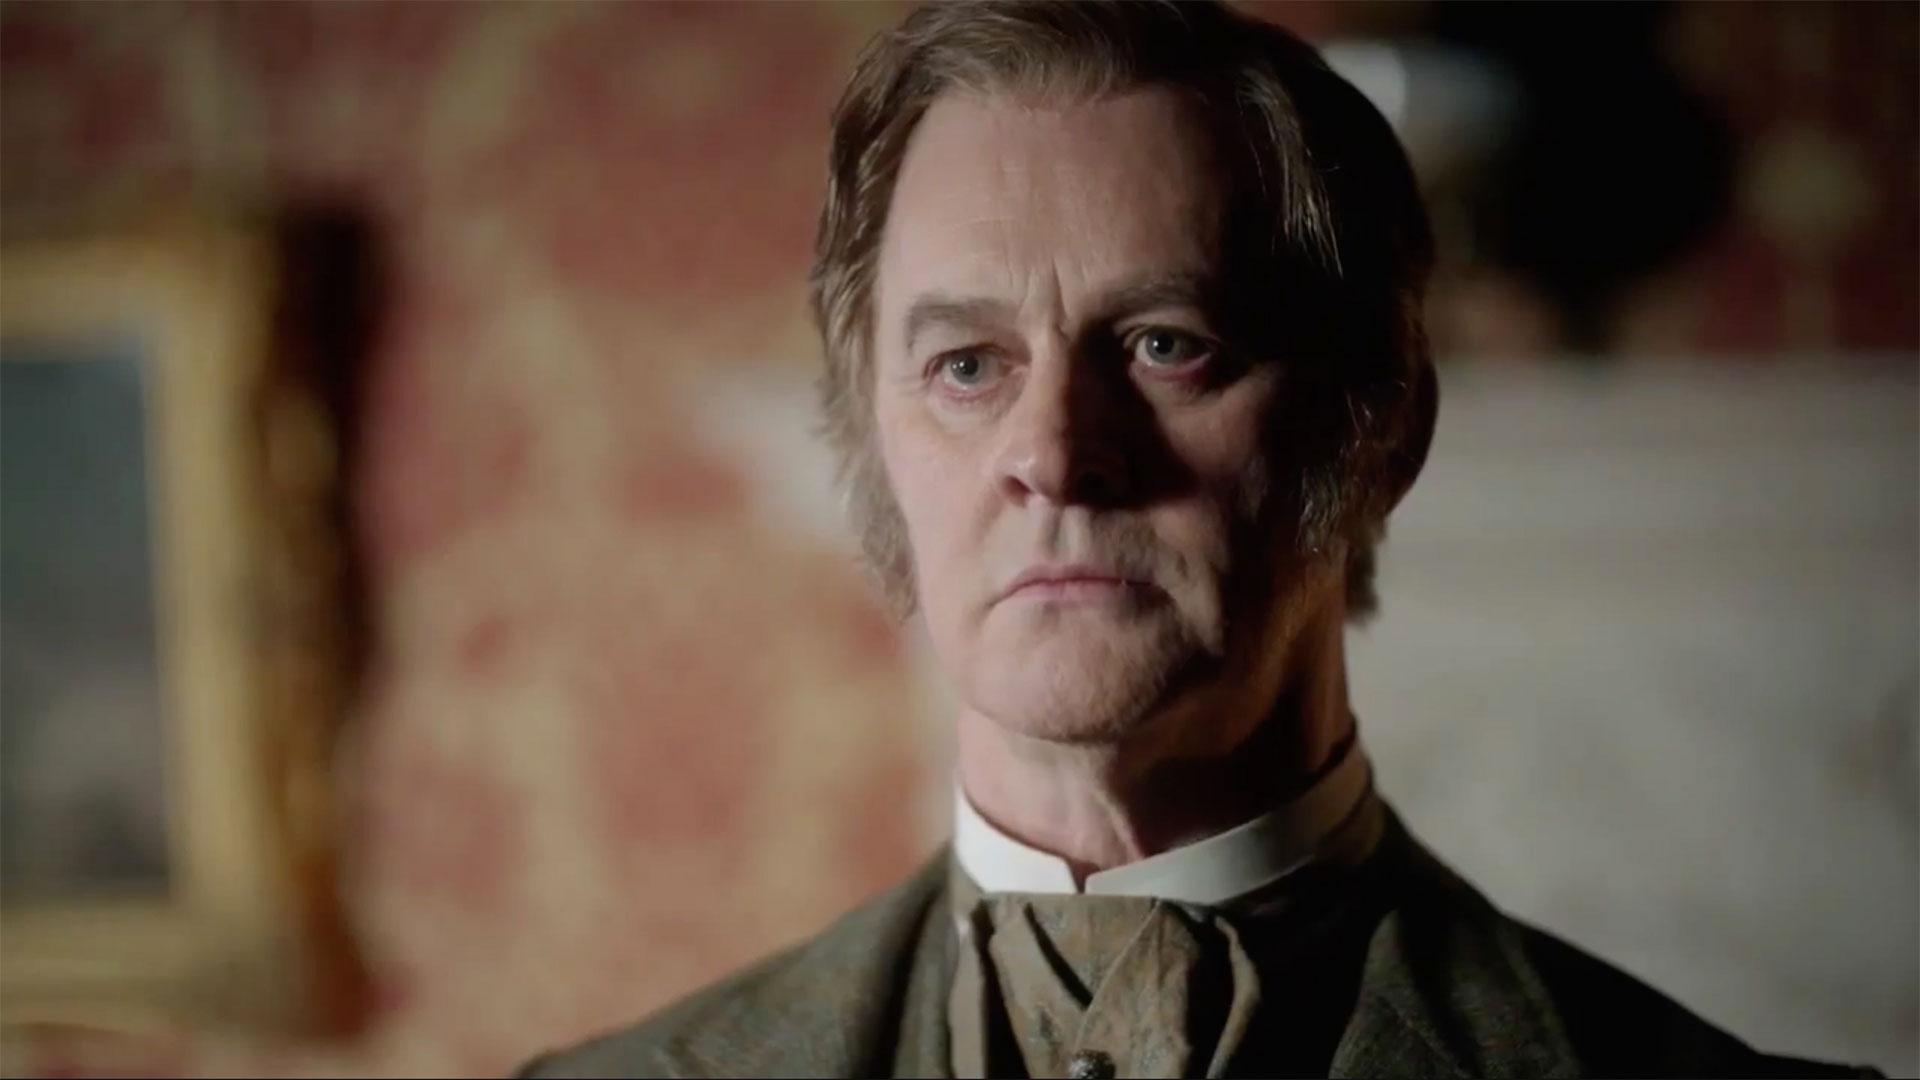 'Sherlock' - 'The Abominable Bride' (Photo: BBC)